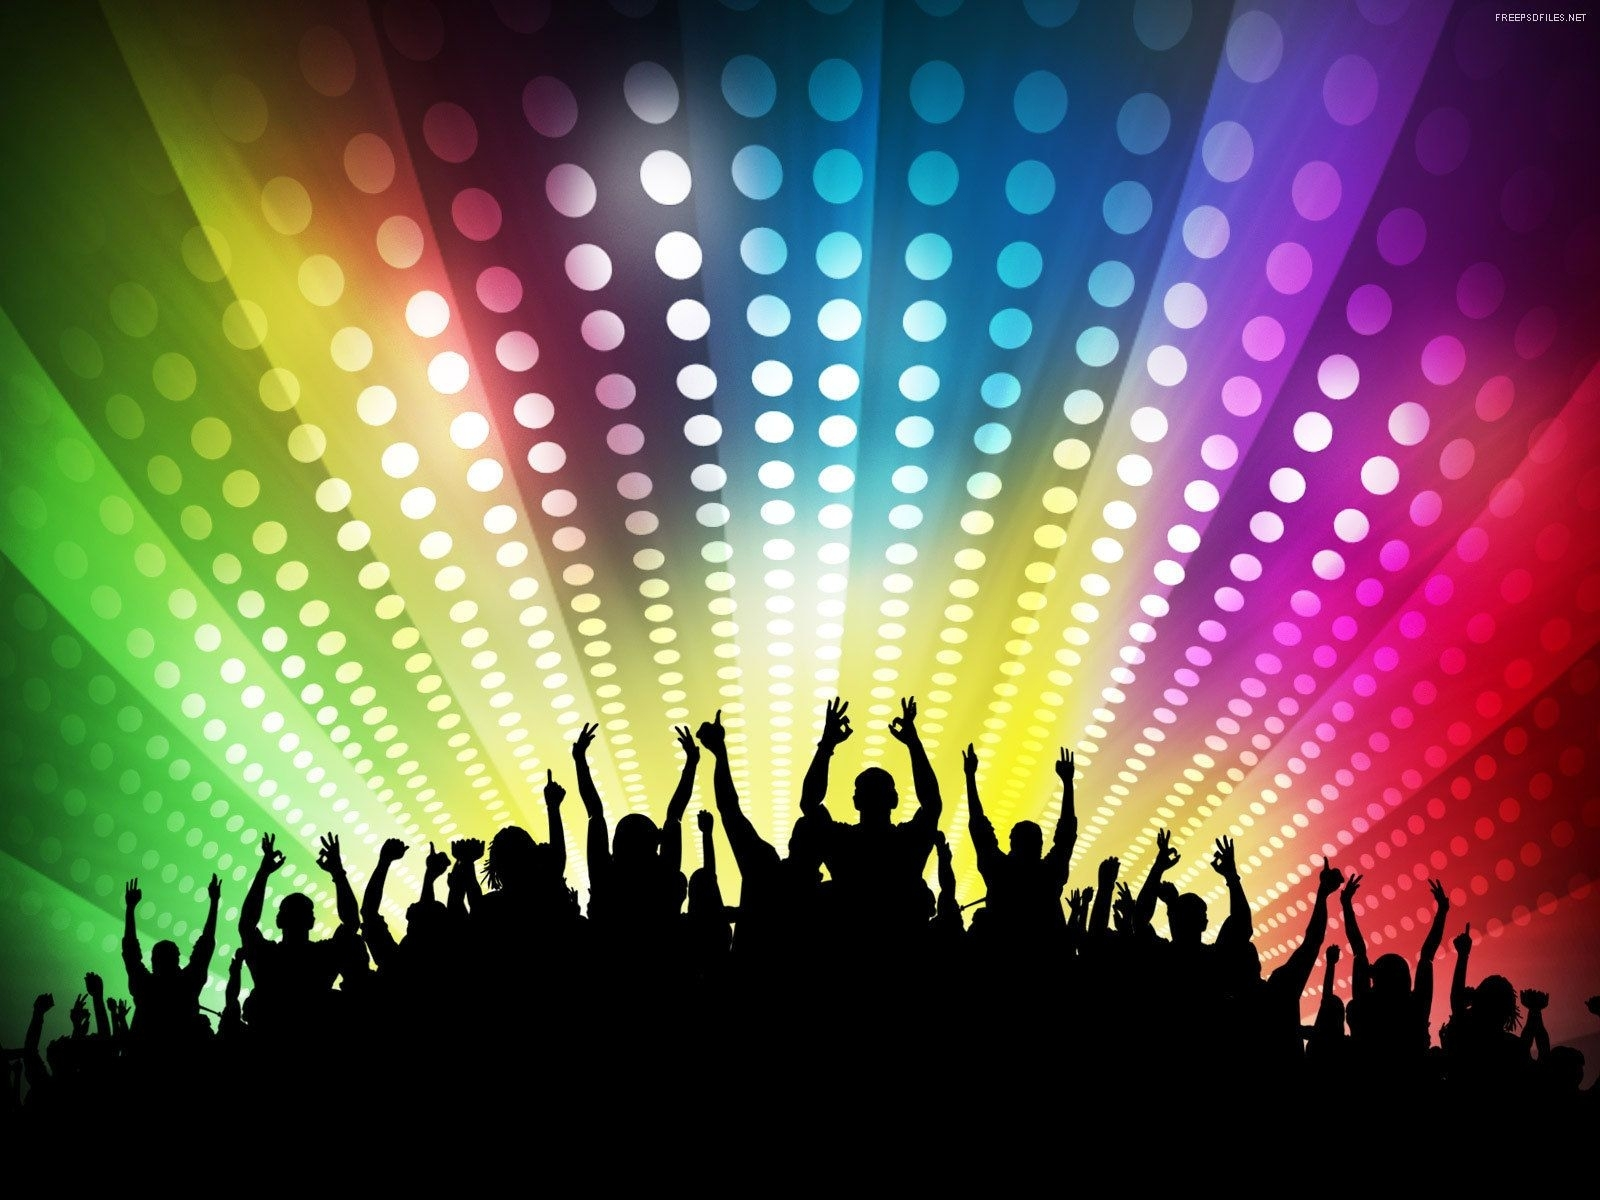 party – high quality hd wallpapers : hd quality 1080p, mgi53mgi